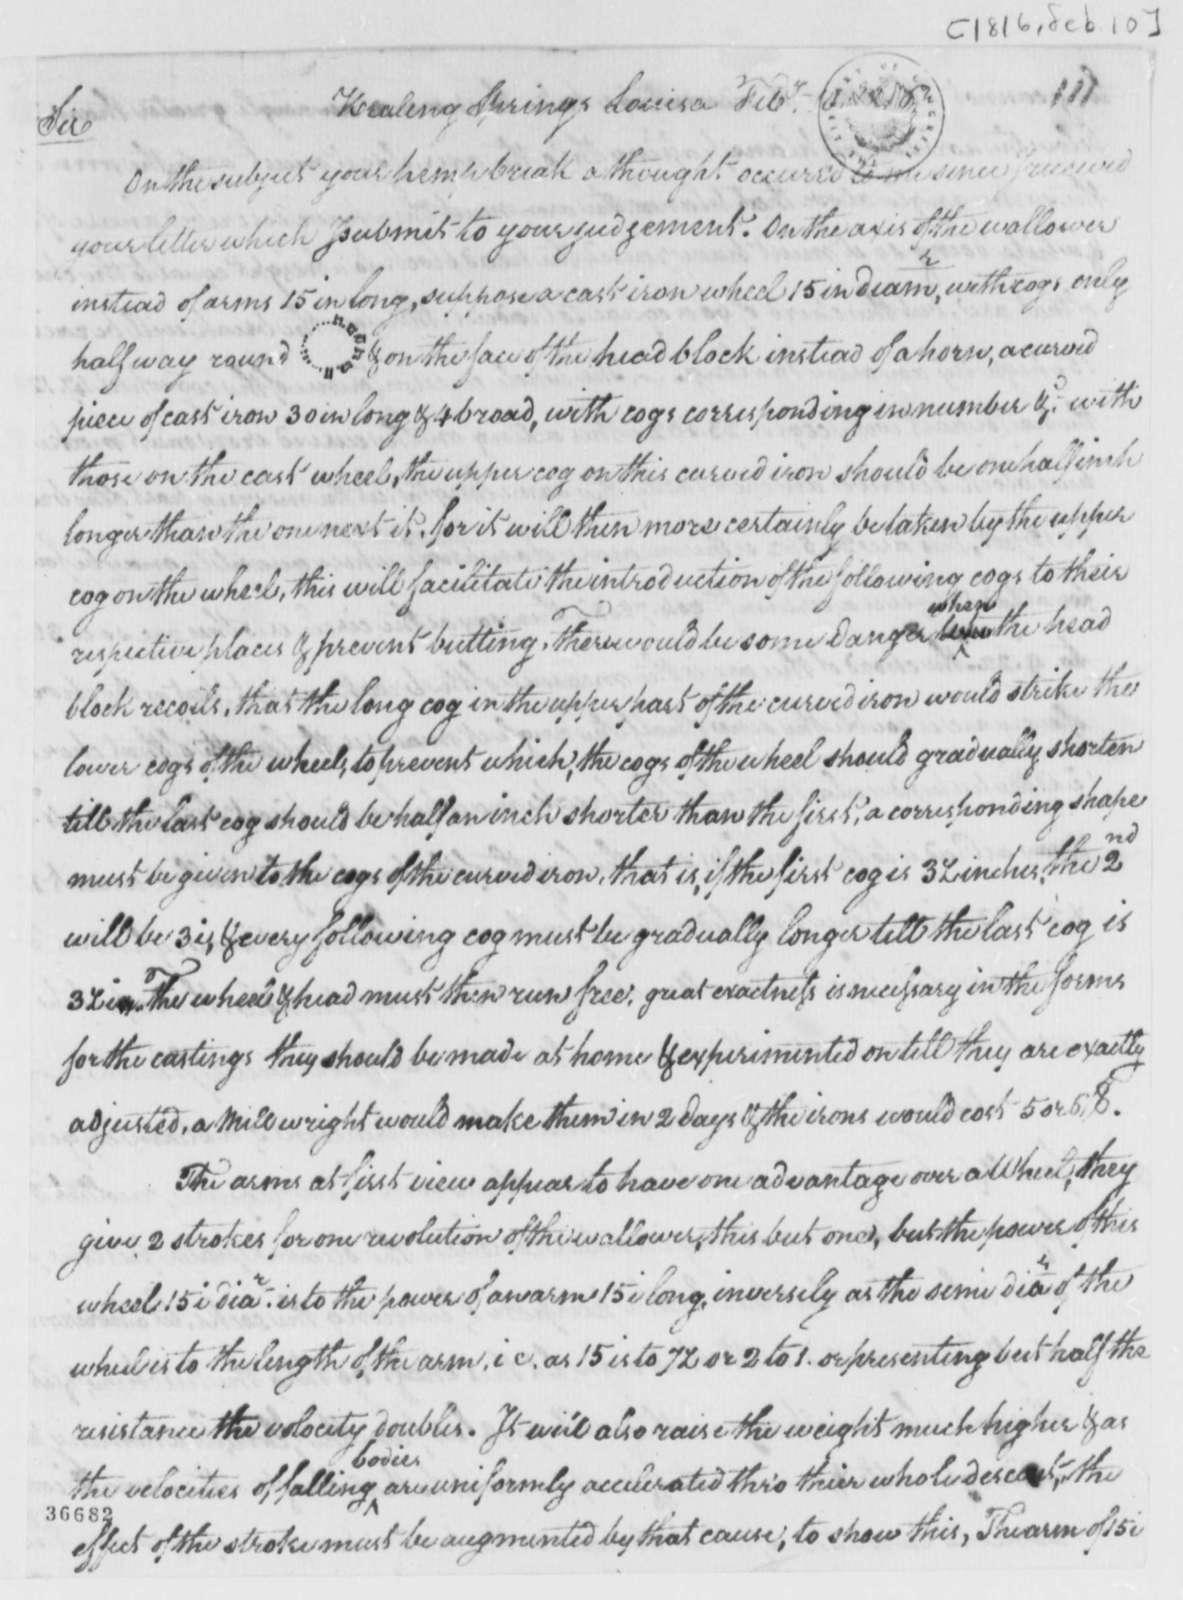 George Fleming to Thomas Jefferson, February 10, 1816